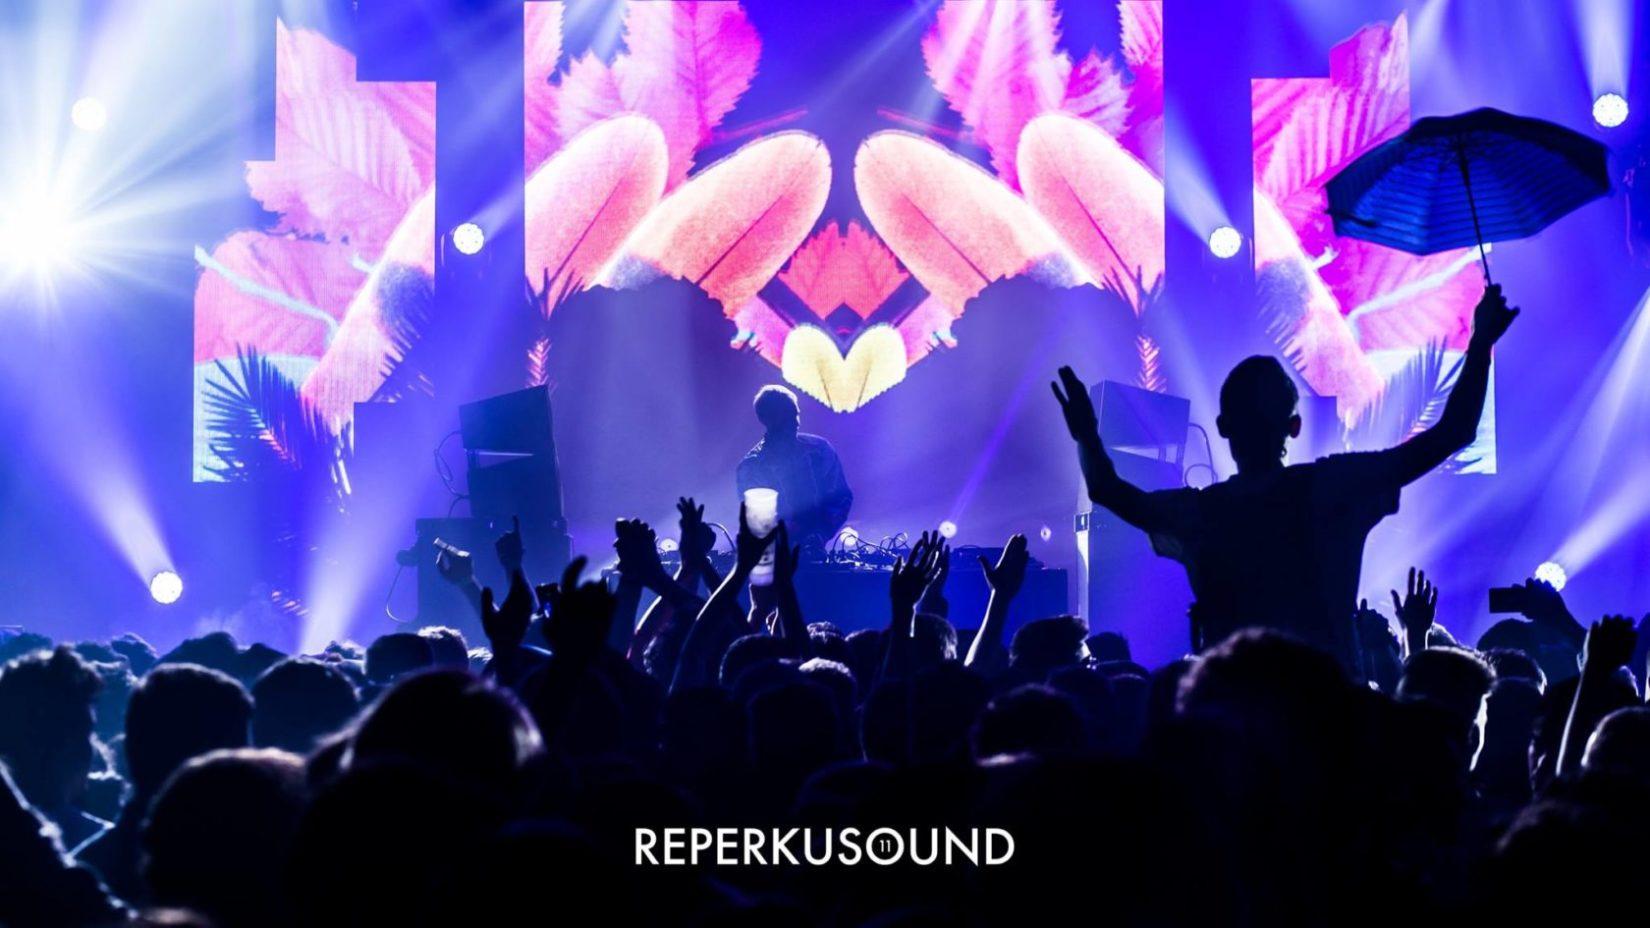 Festival Reperkusound au Double Mixte